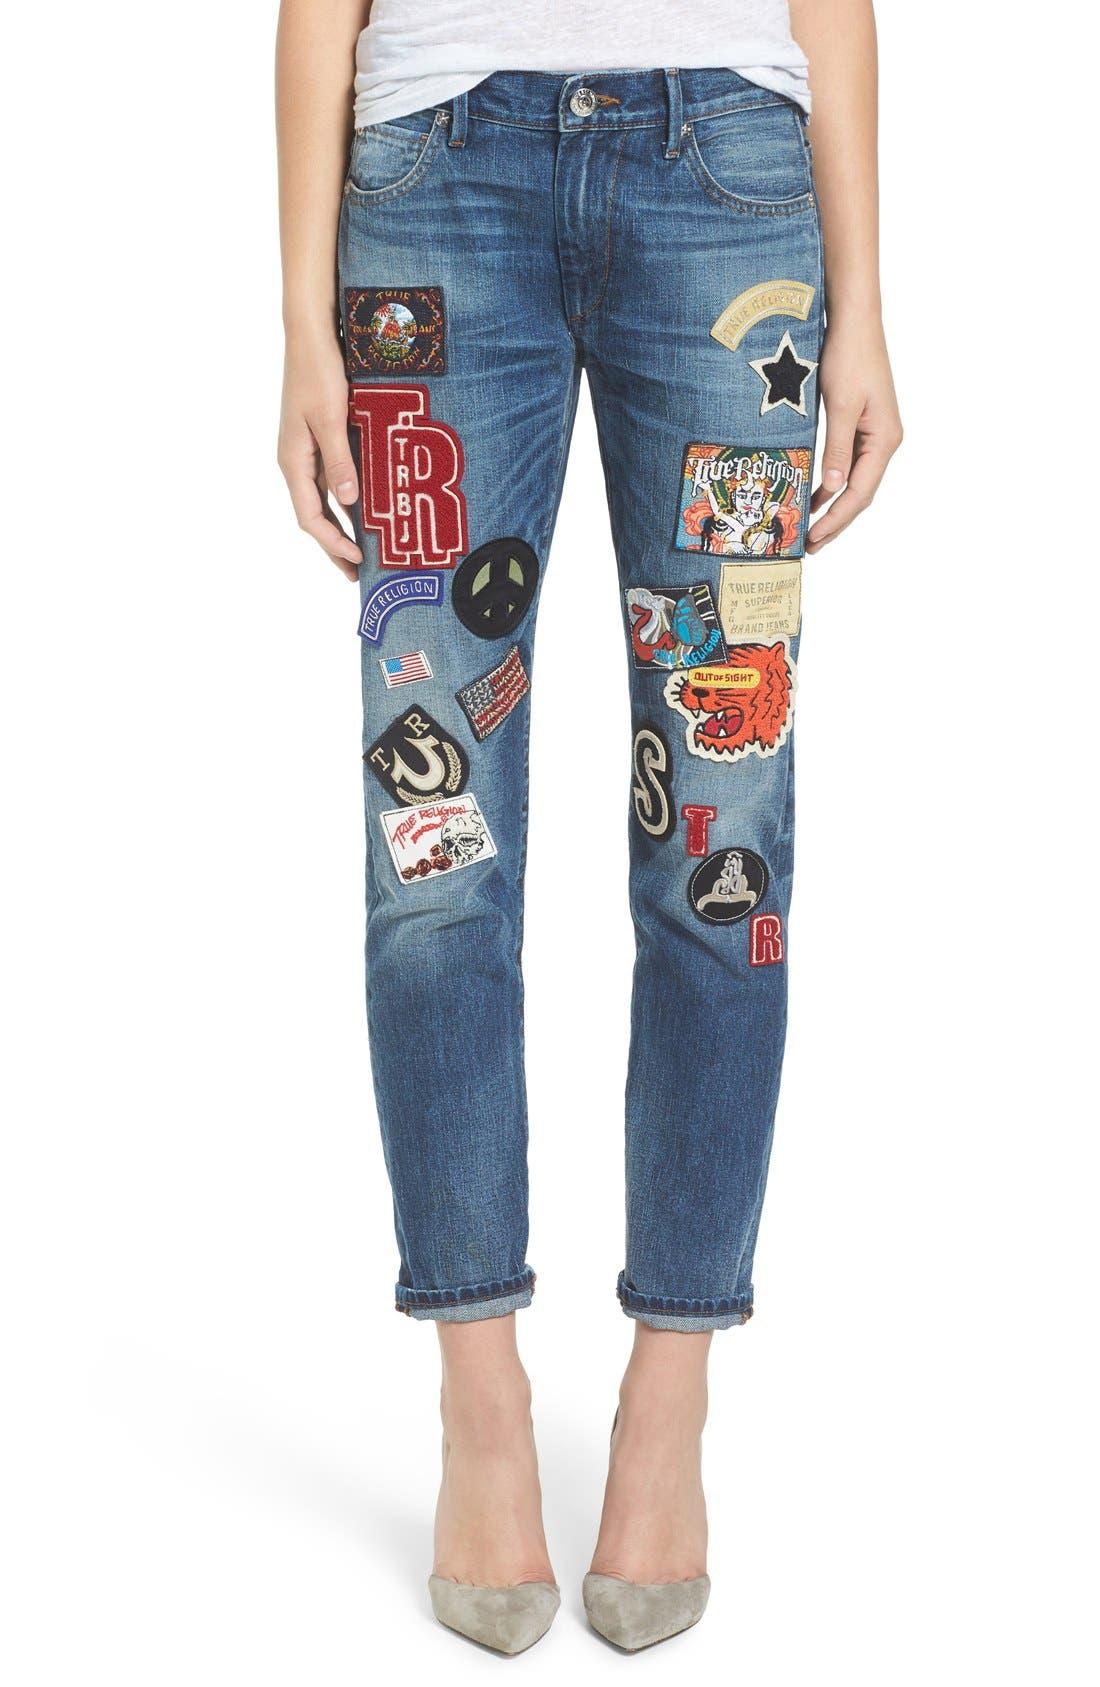 Alternate Image 1 Selected - True Religion Brand Jeans Audrey Slim Boyfriend Jeans (Coronet Blue)